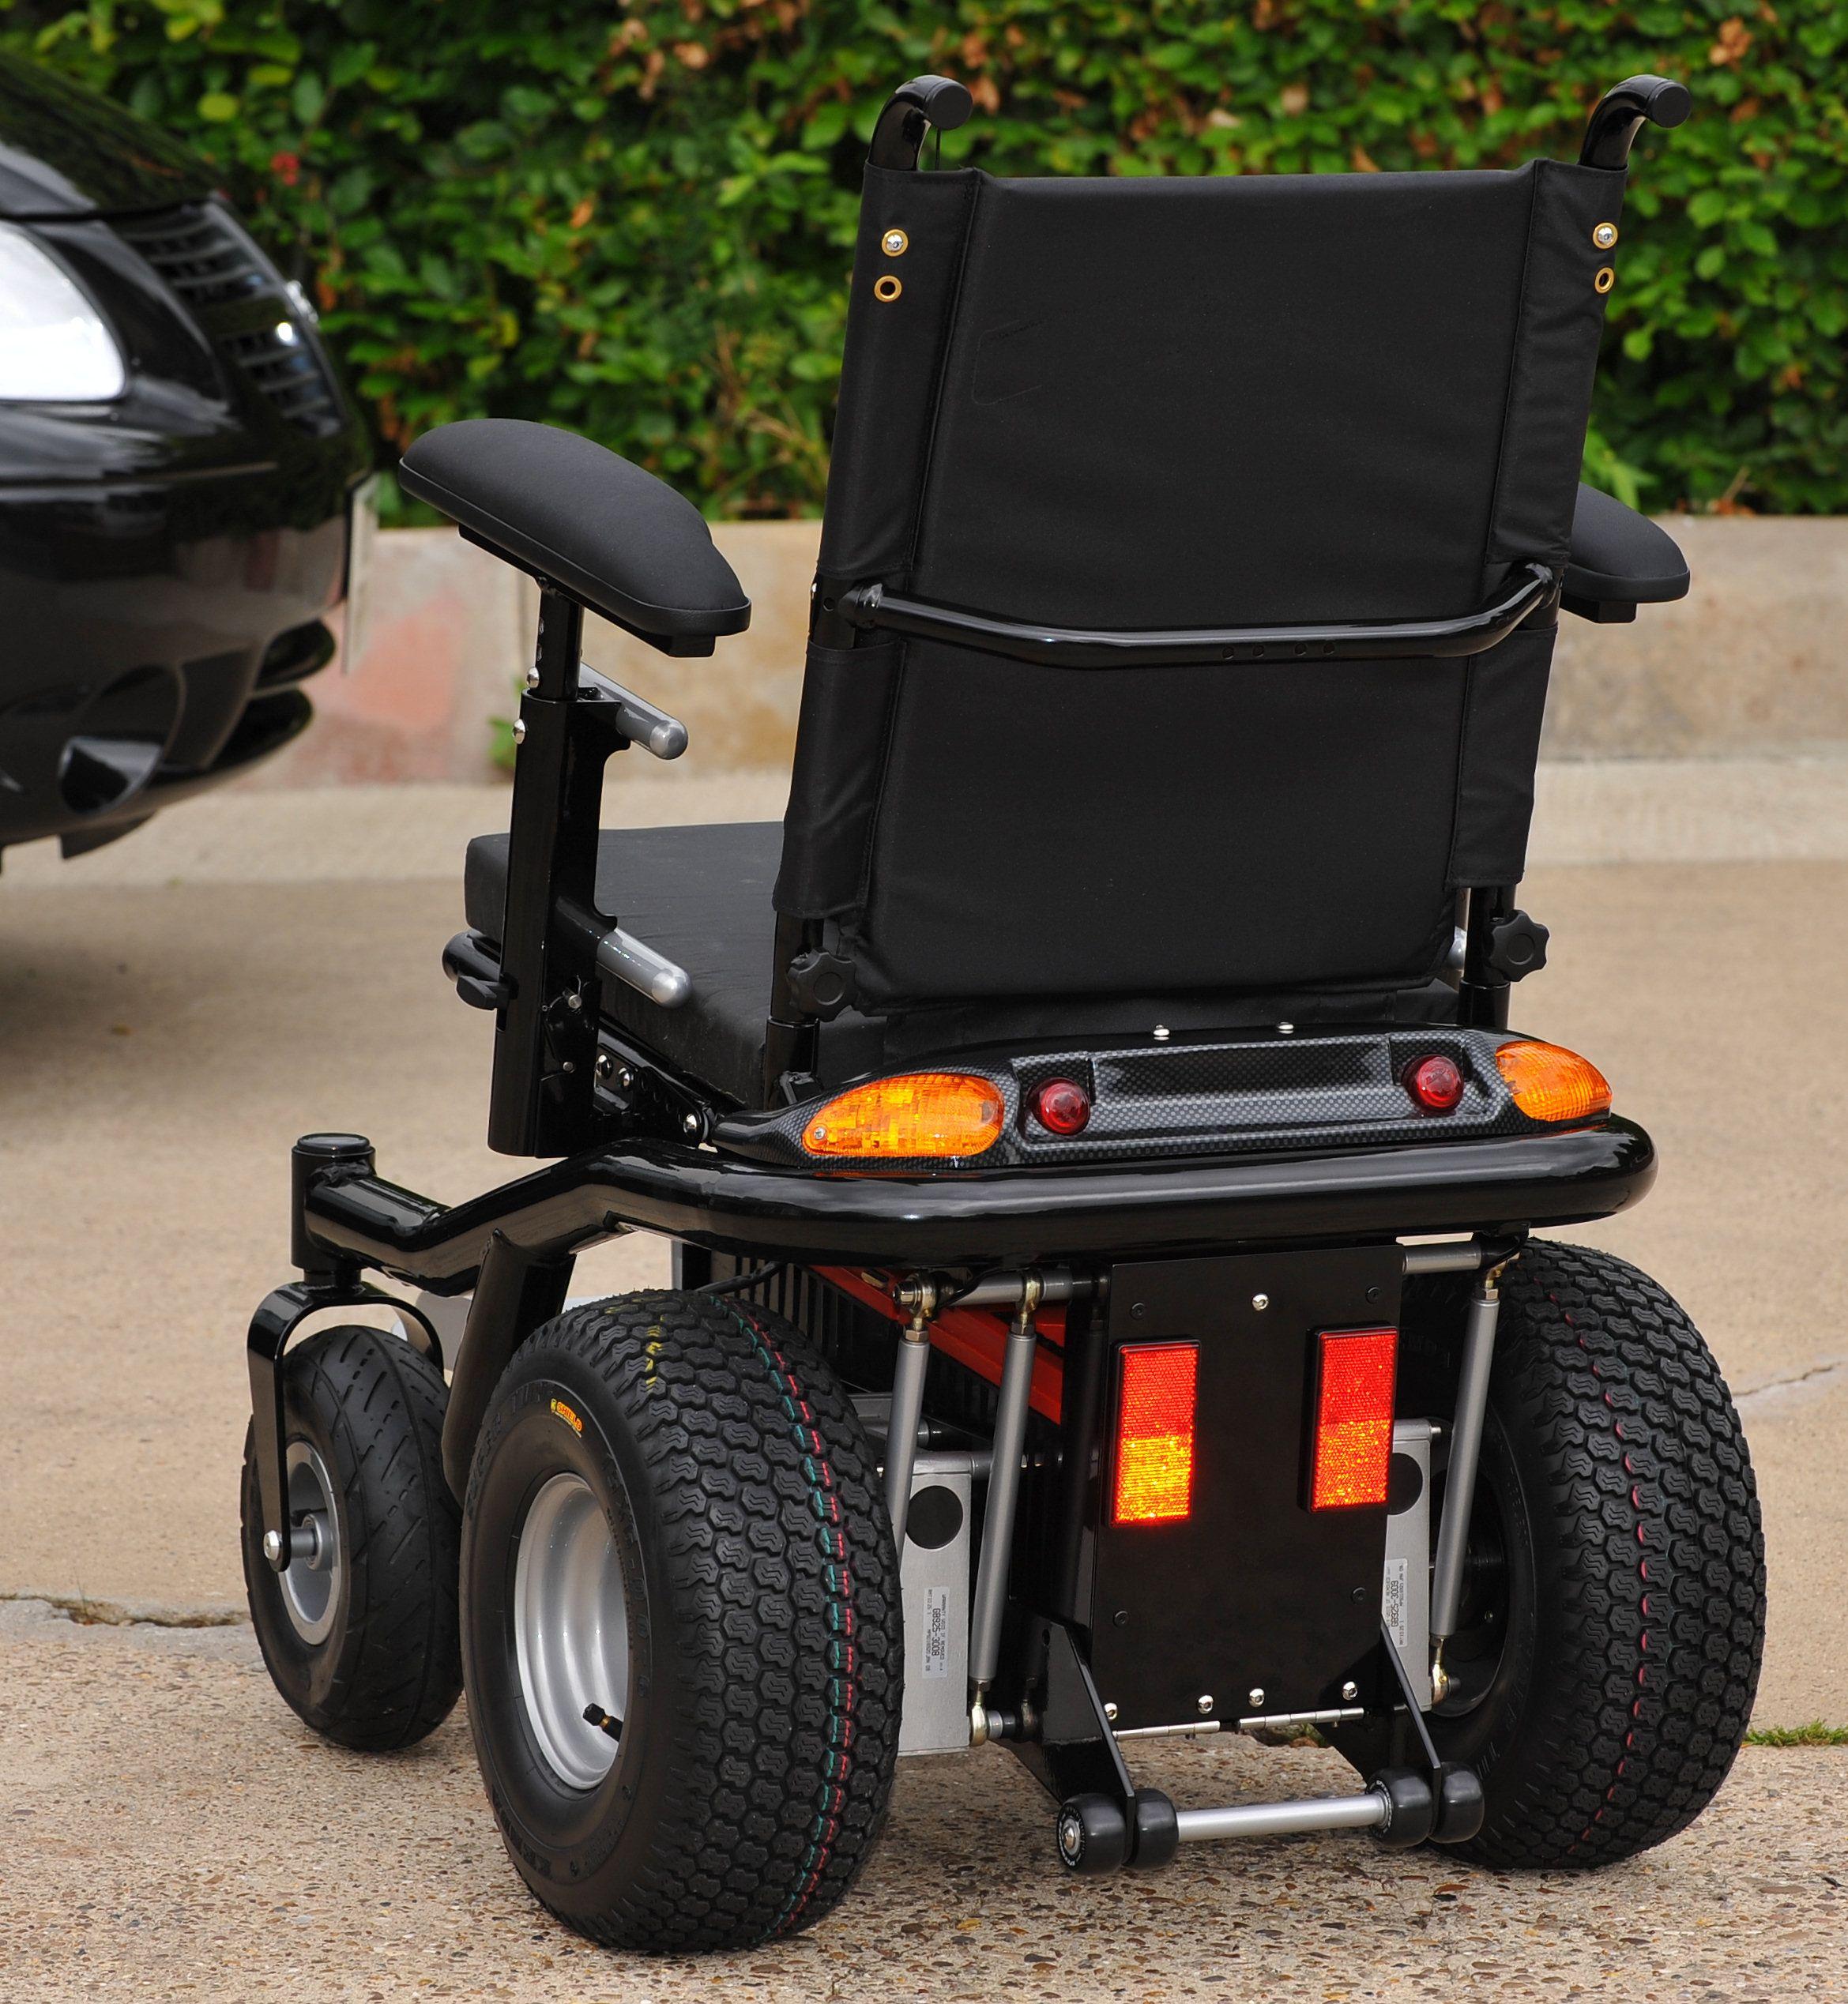 Off Road Electric Wheelchair Jpg 2 339 2 537 Pixels Wheelchair Accessories Powered Wheelchair Wheelchair